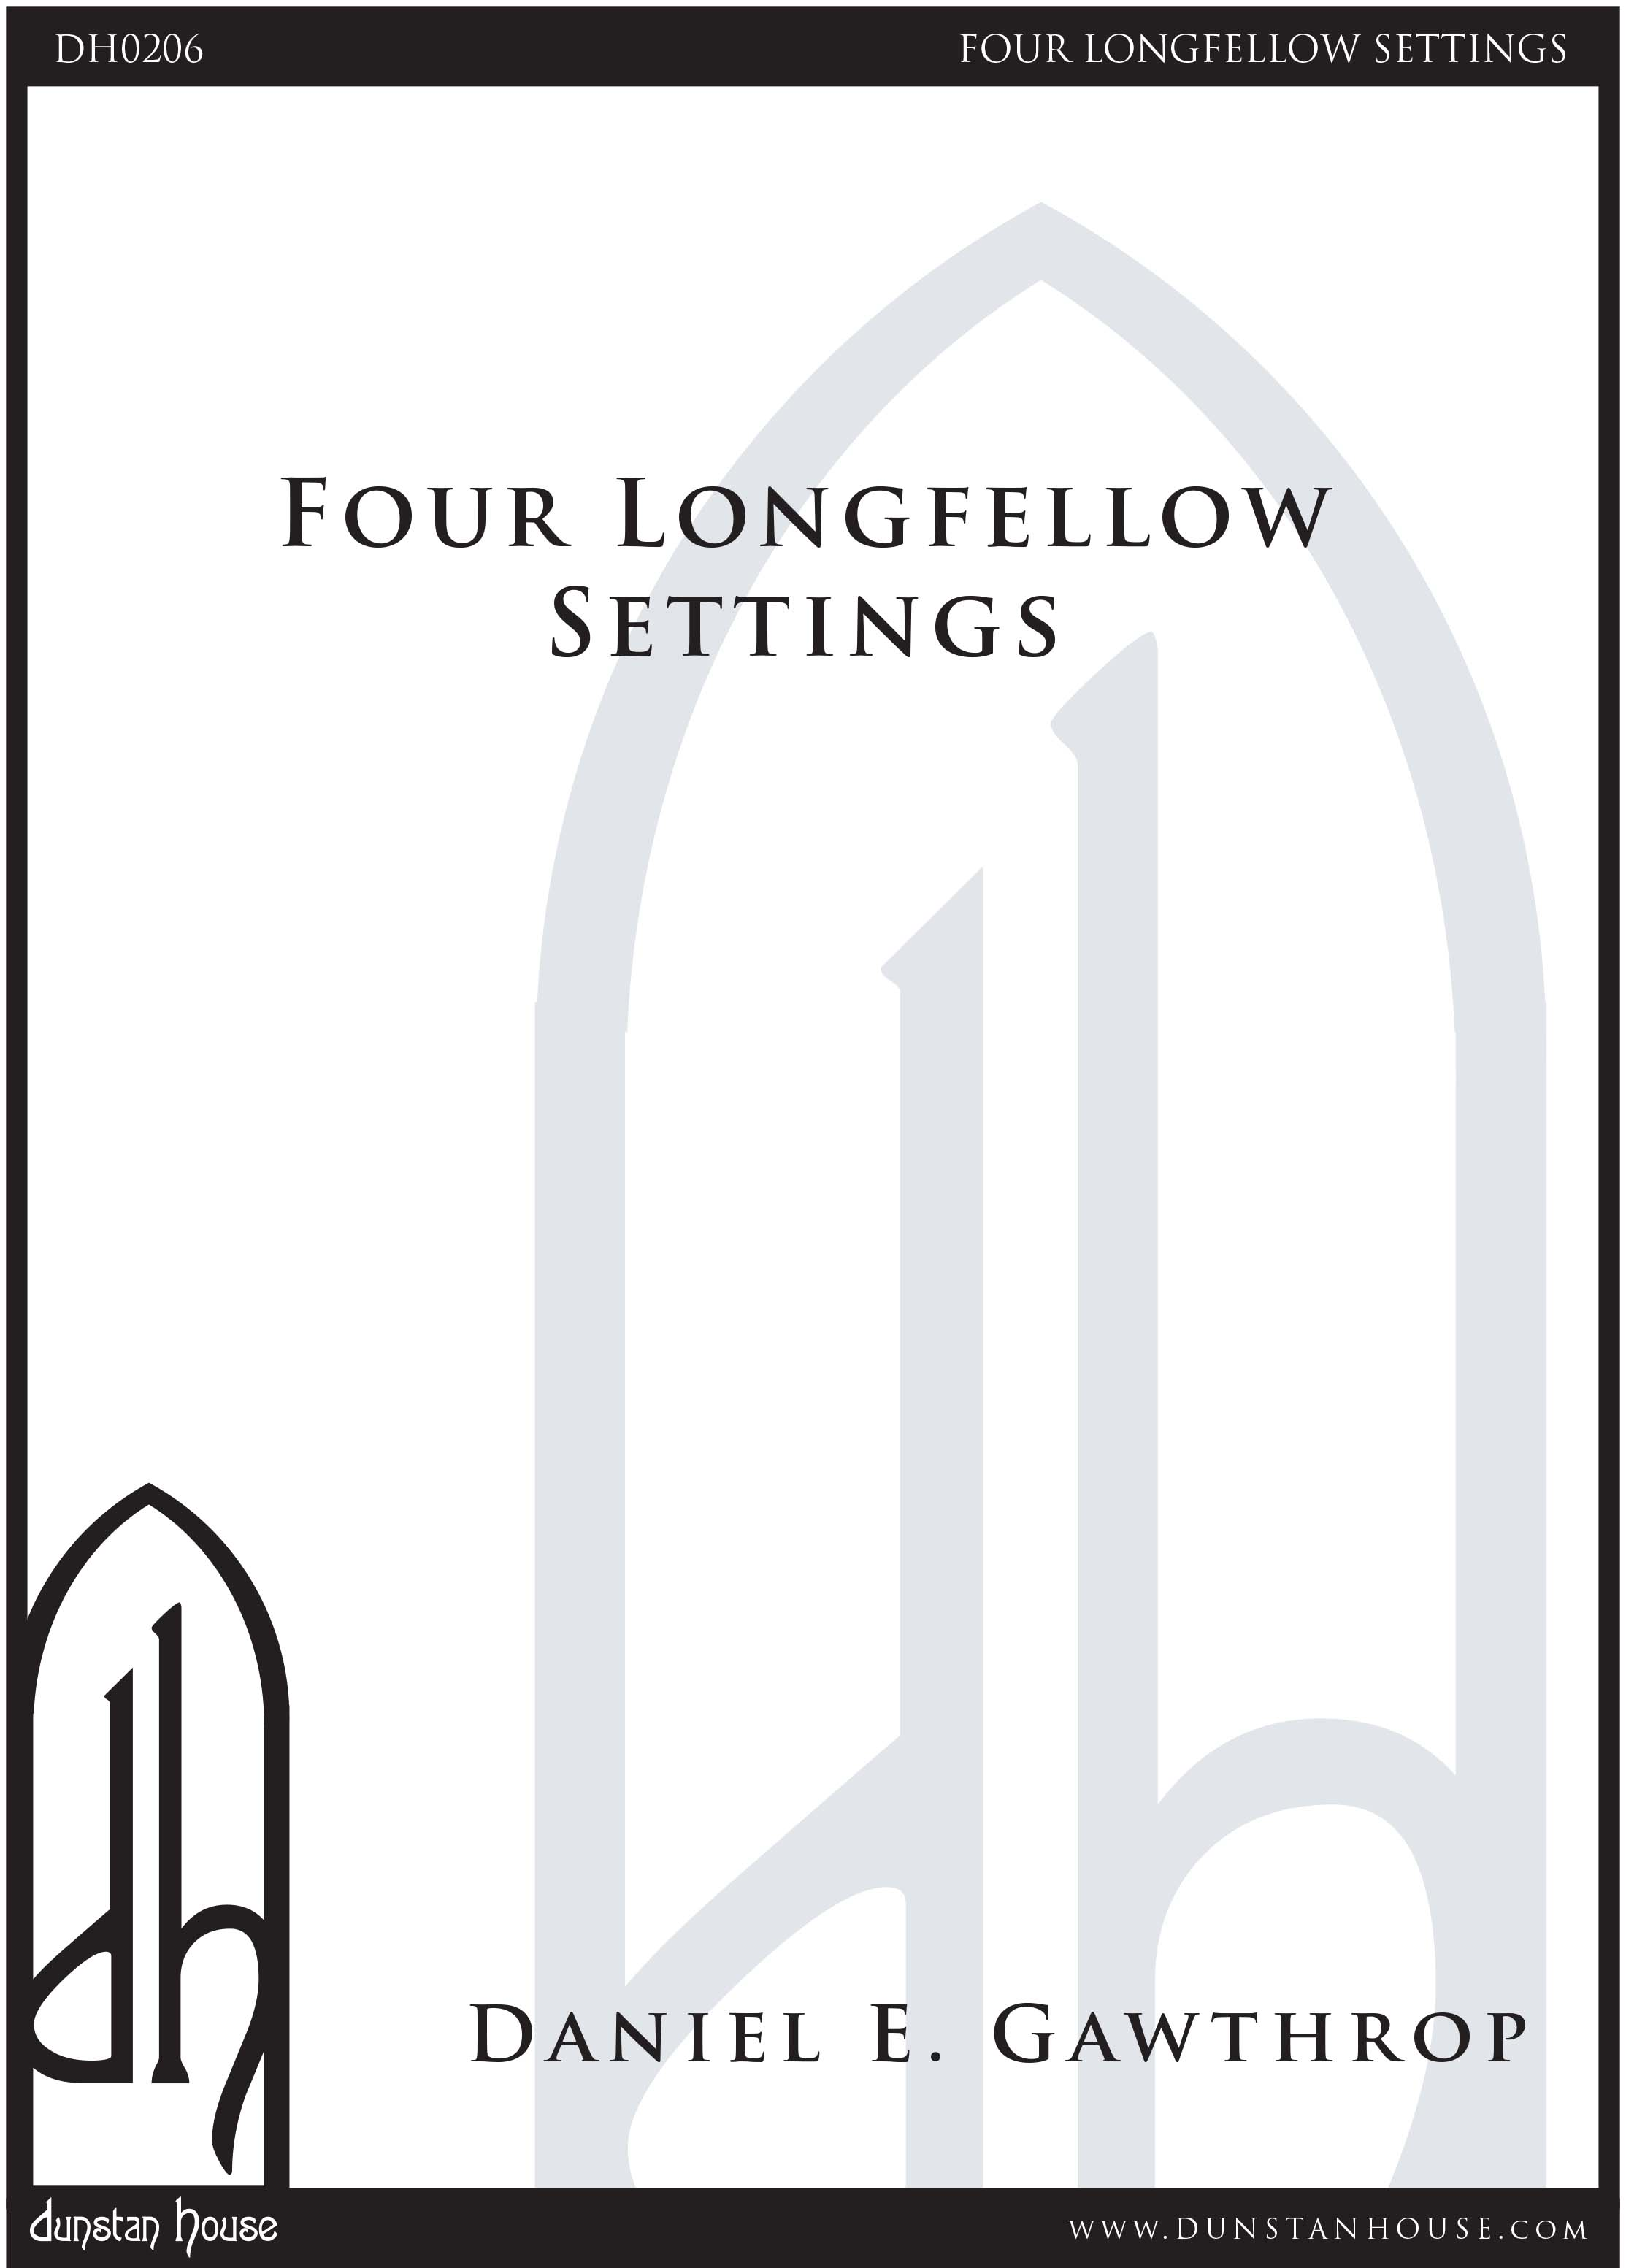 Four Longfellow Settings